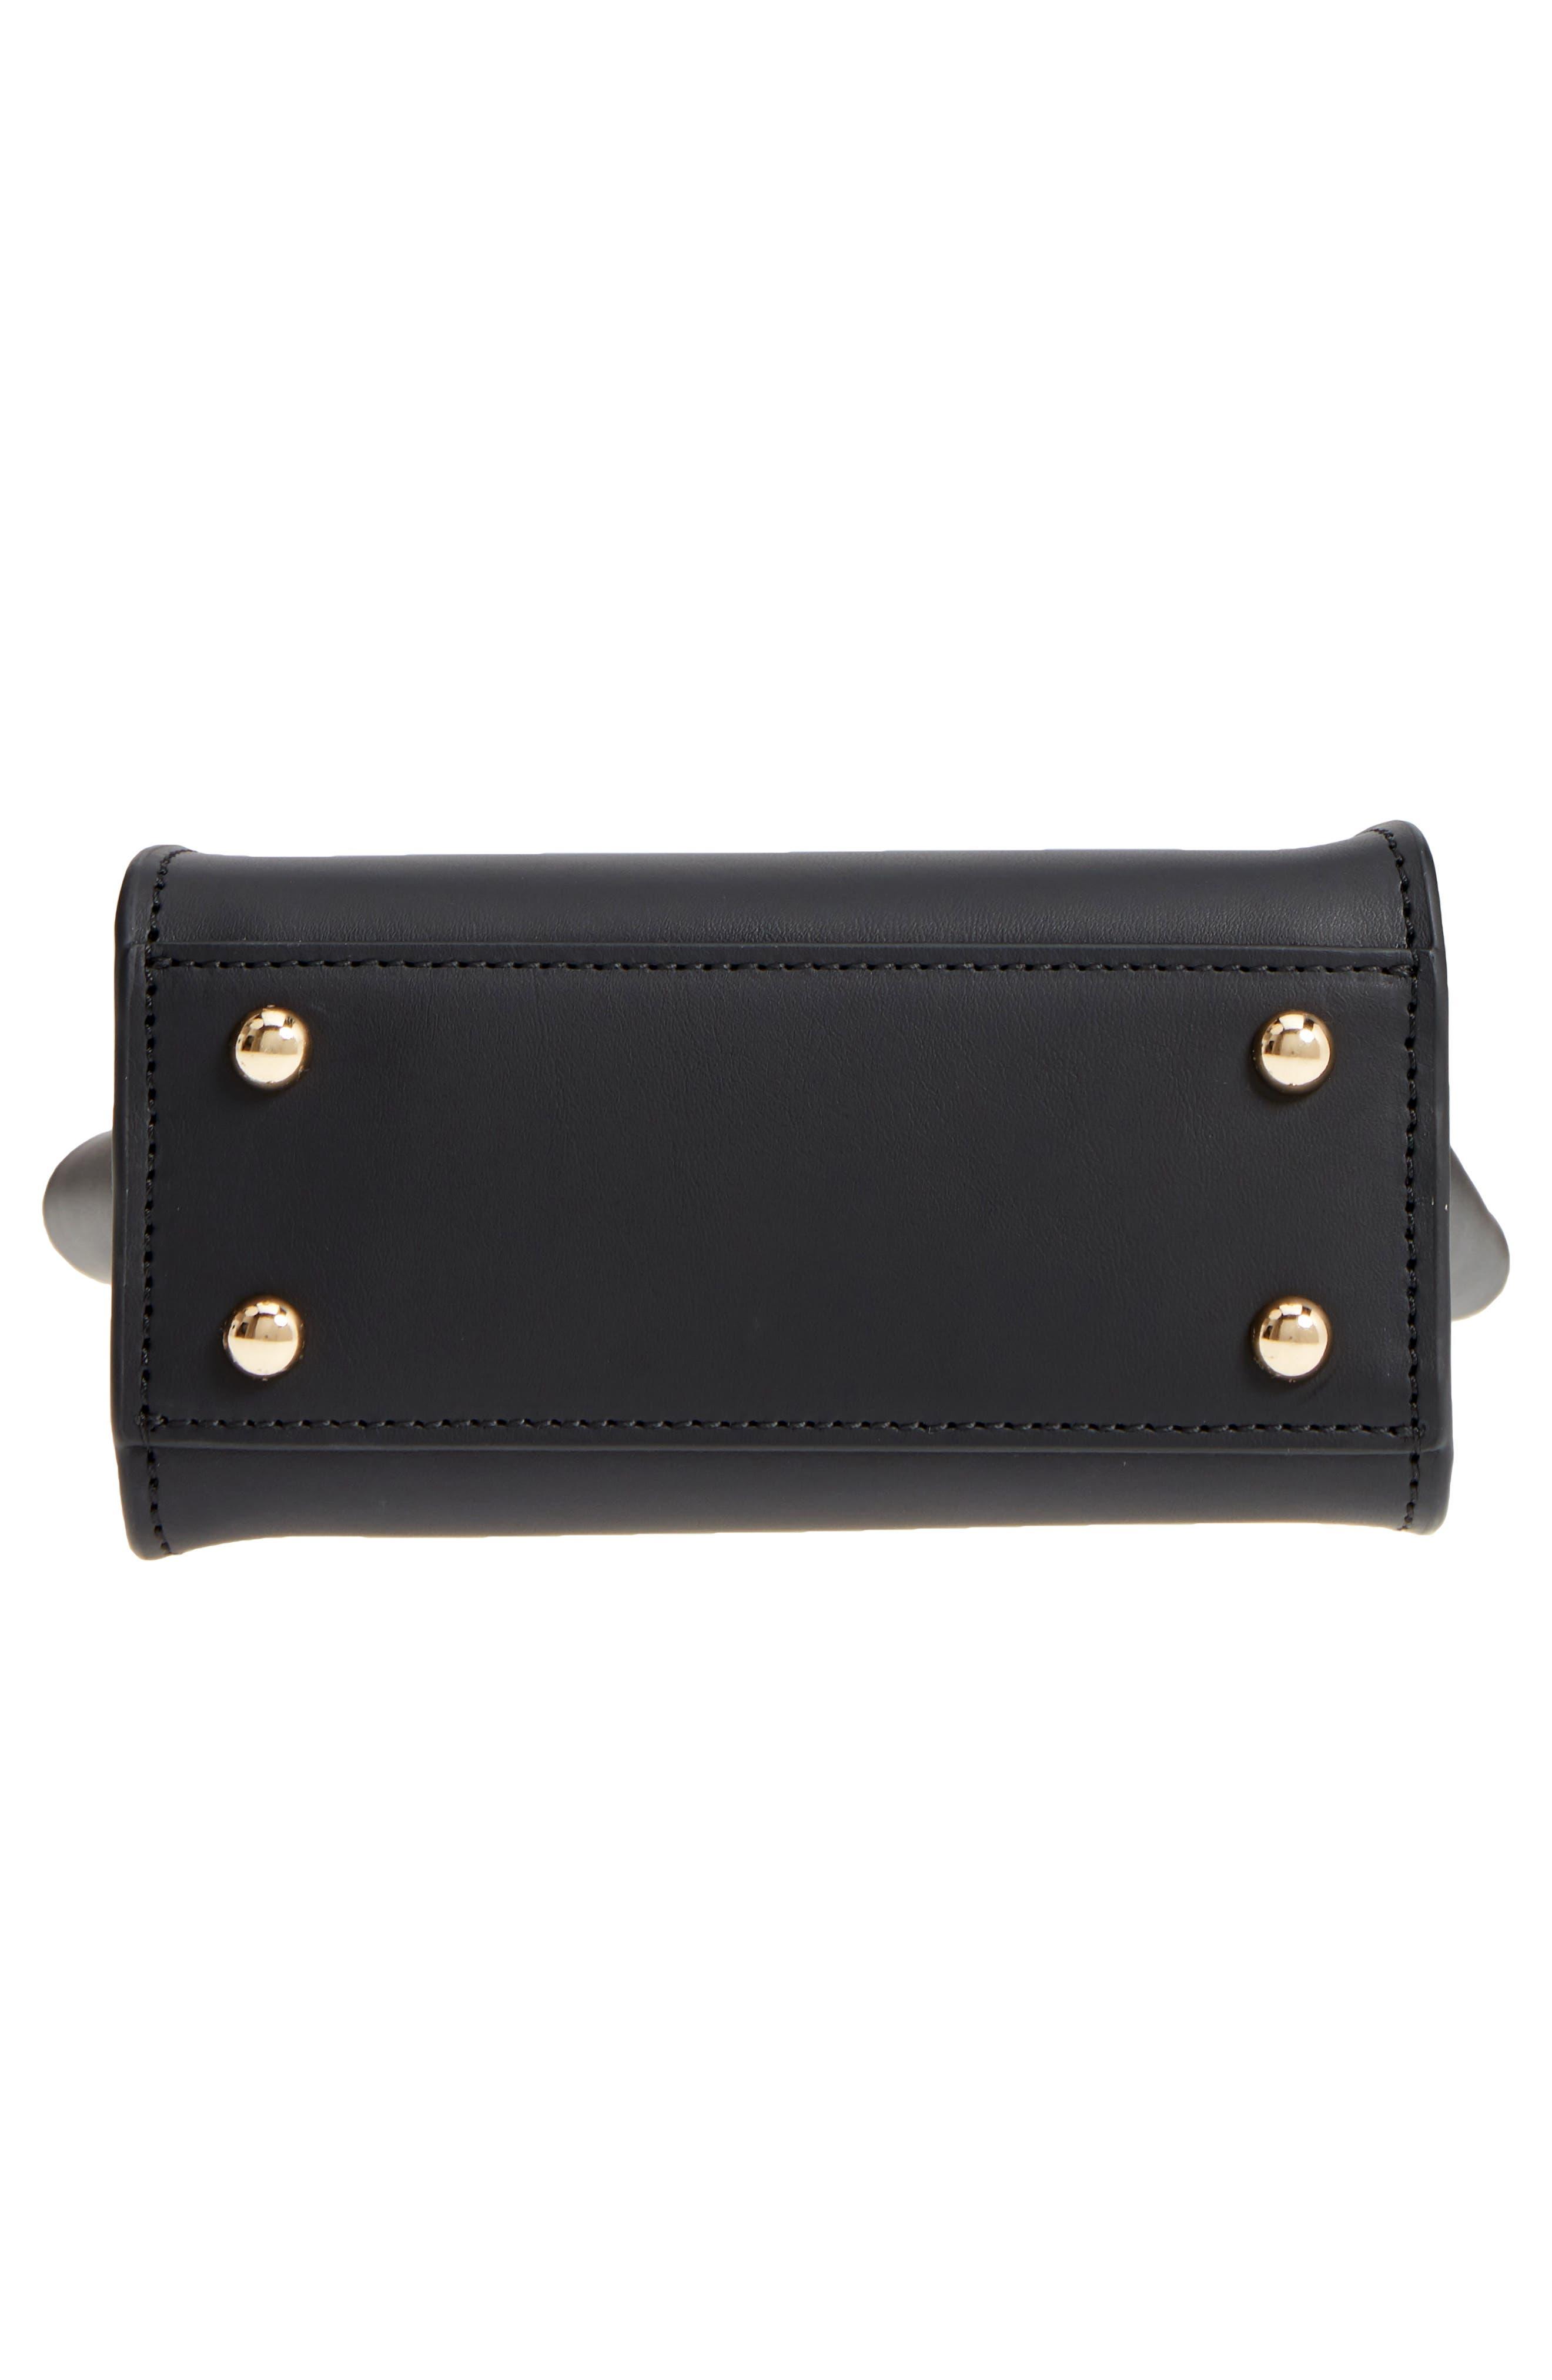 ZAC ZAC POSEN,                             Mini Eartha Iconic Calfskin Leather Top Handle Satchel,                             Alternate thumbnail 6, color,                             001